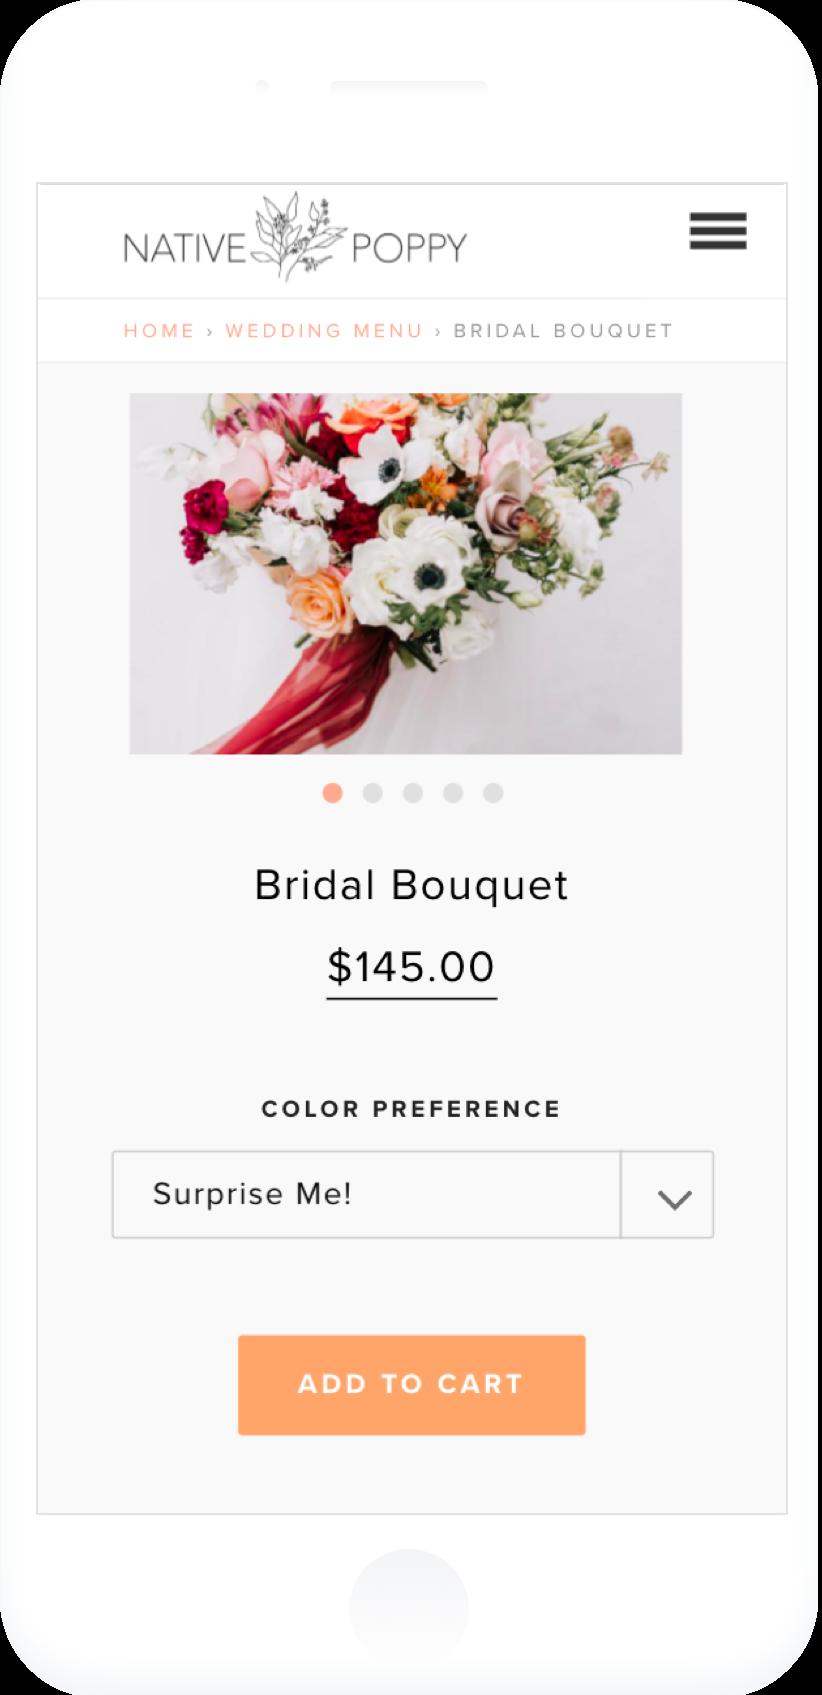 mobile site design for native poppy flower shop.